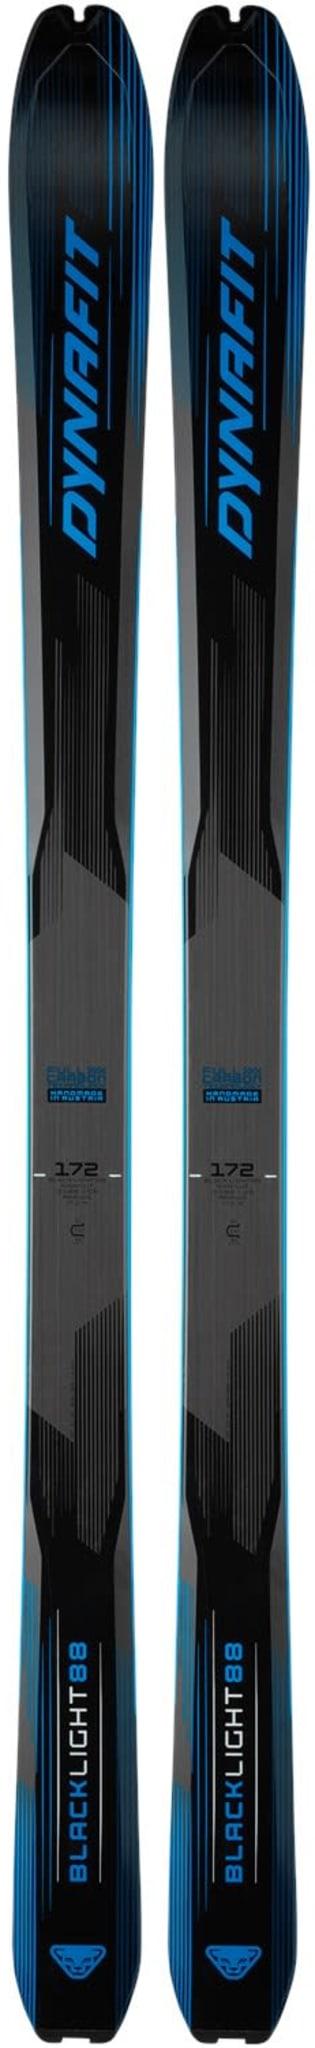 Blacklight 88 & Titan Vario 2